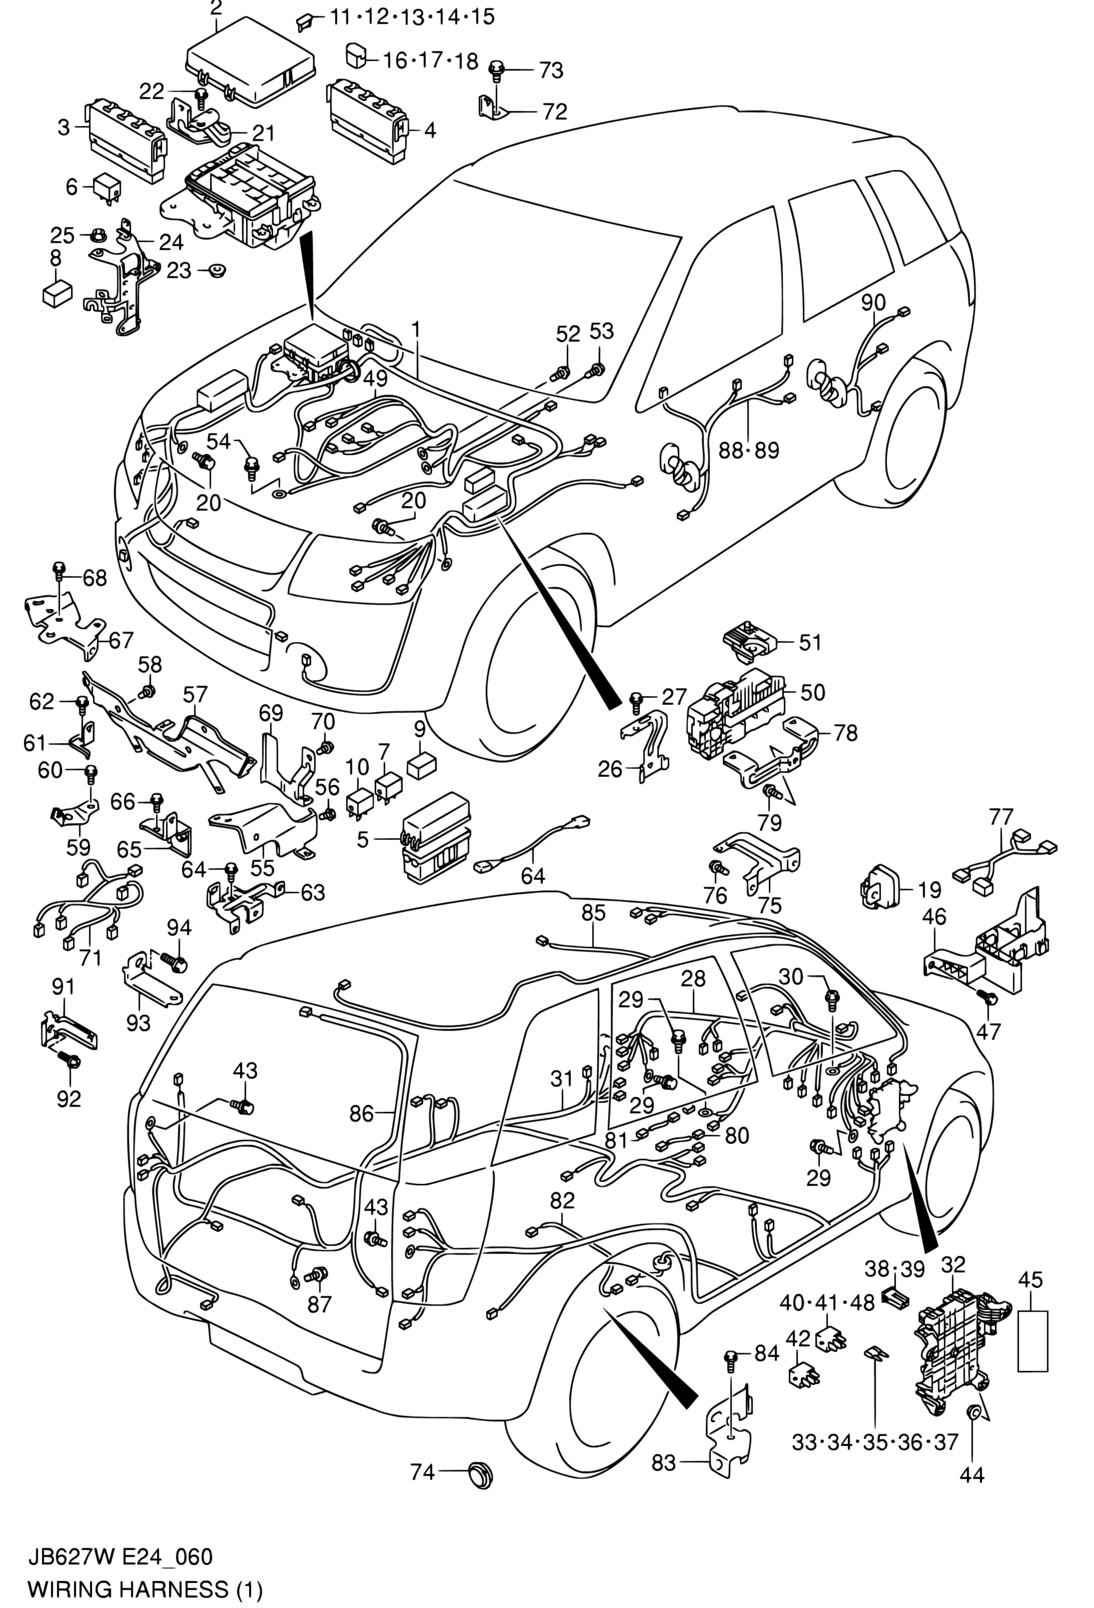 All Regions, Grand Vitara, JB627W (E24,E38), Electrical, 60